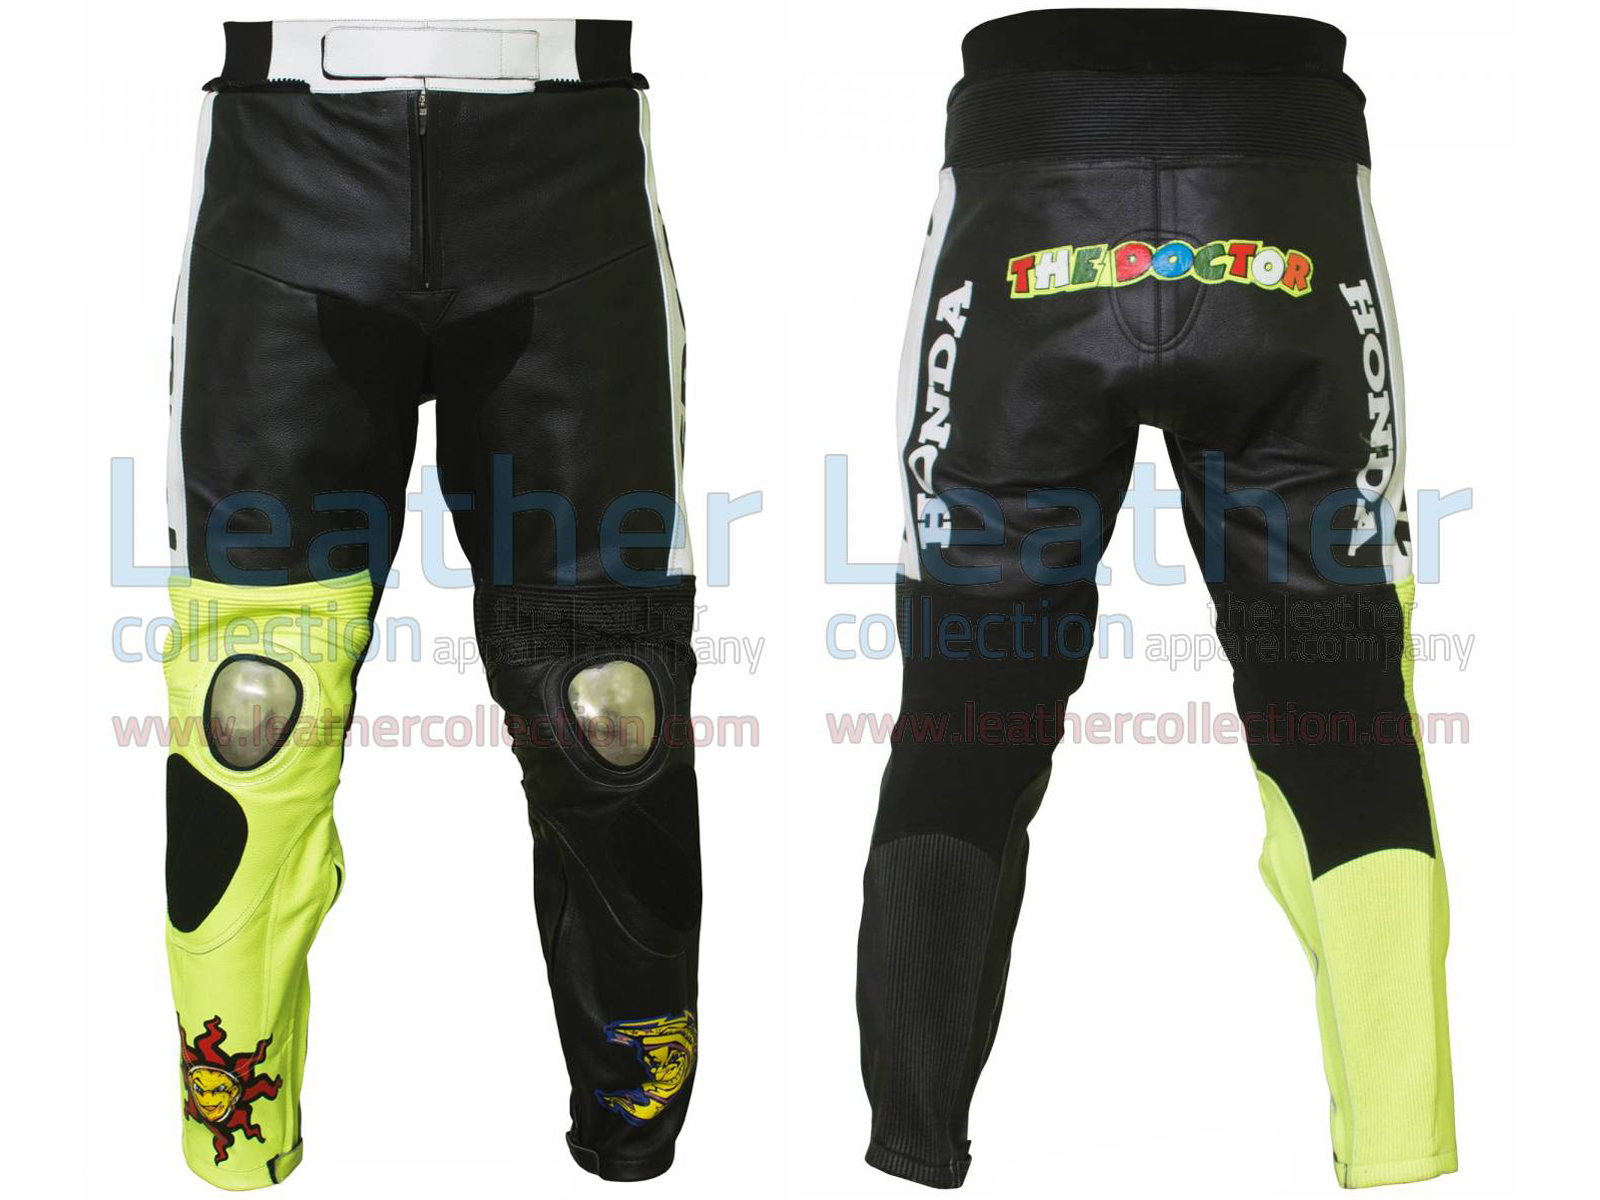 Valentino Rossi Repsol Honda MotoGP 2003 Pants